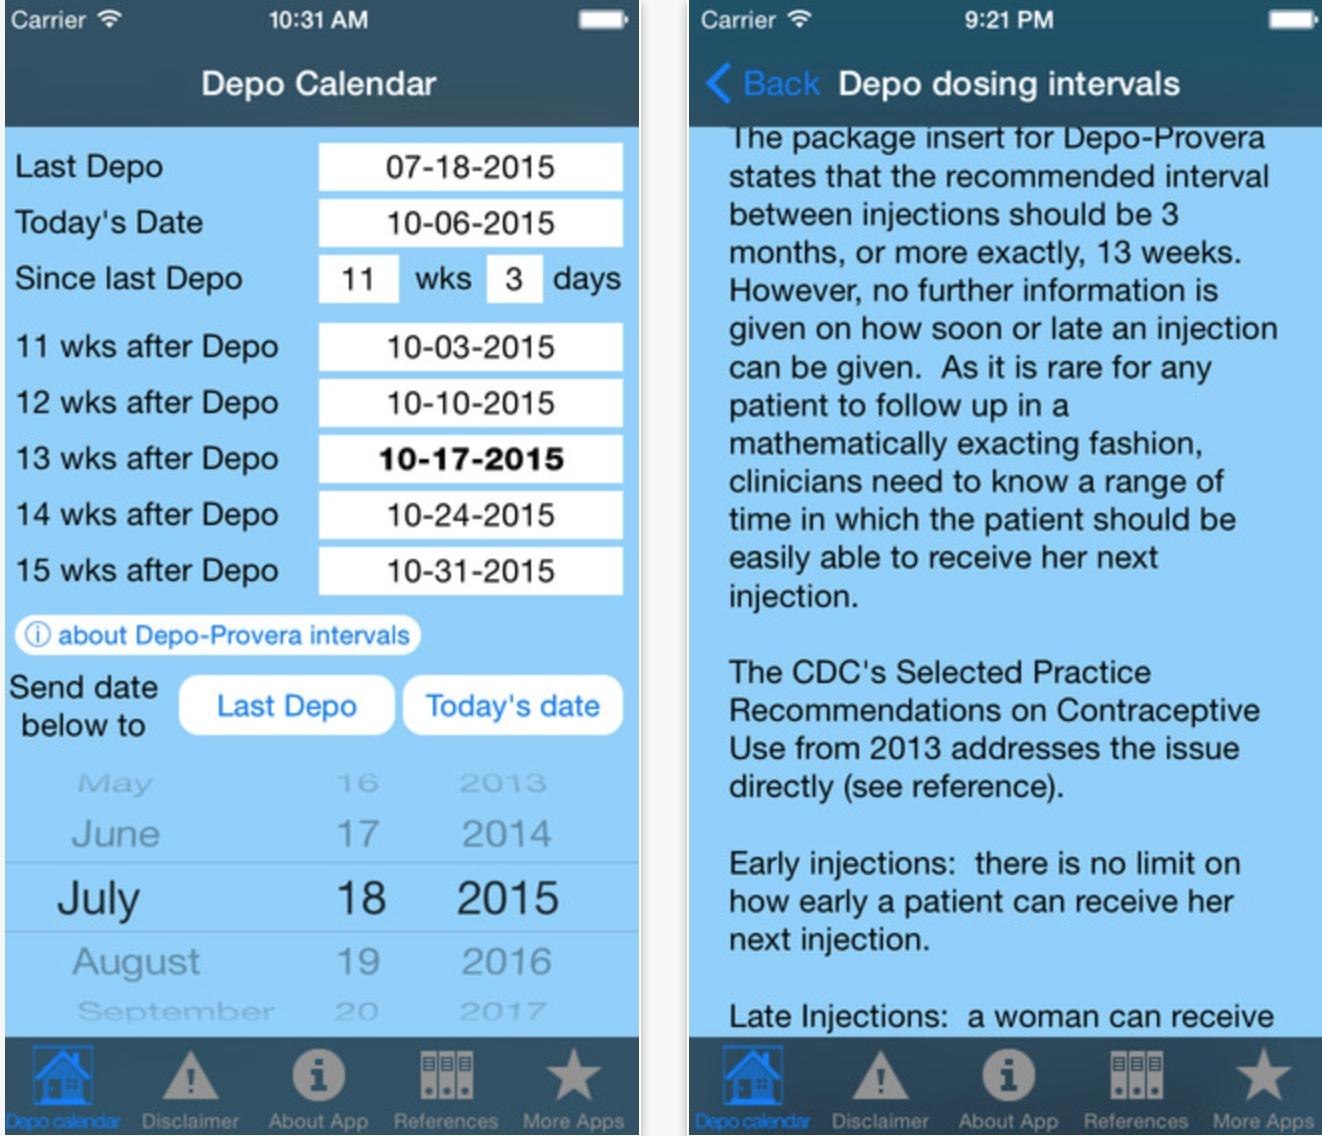 Depo Calendar App Could Significantly Improve Contraception  Depo-Provera Calcualtor Calender